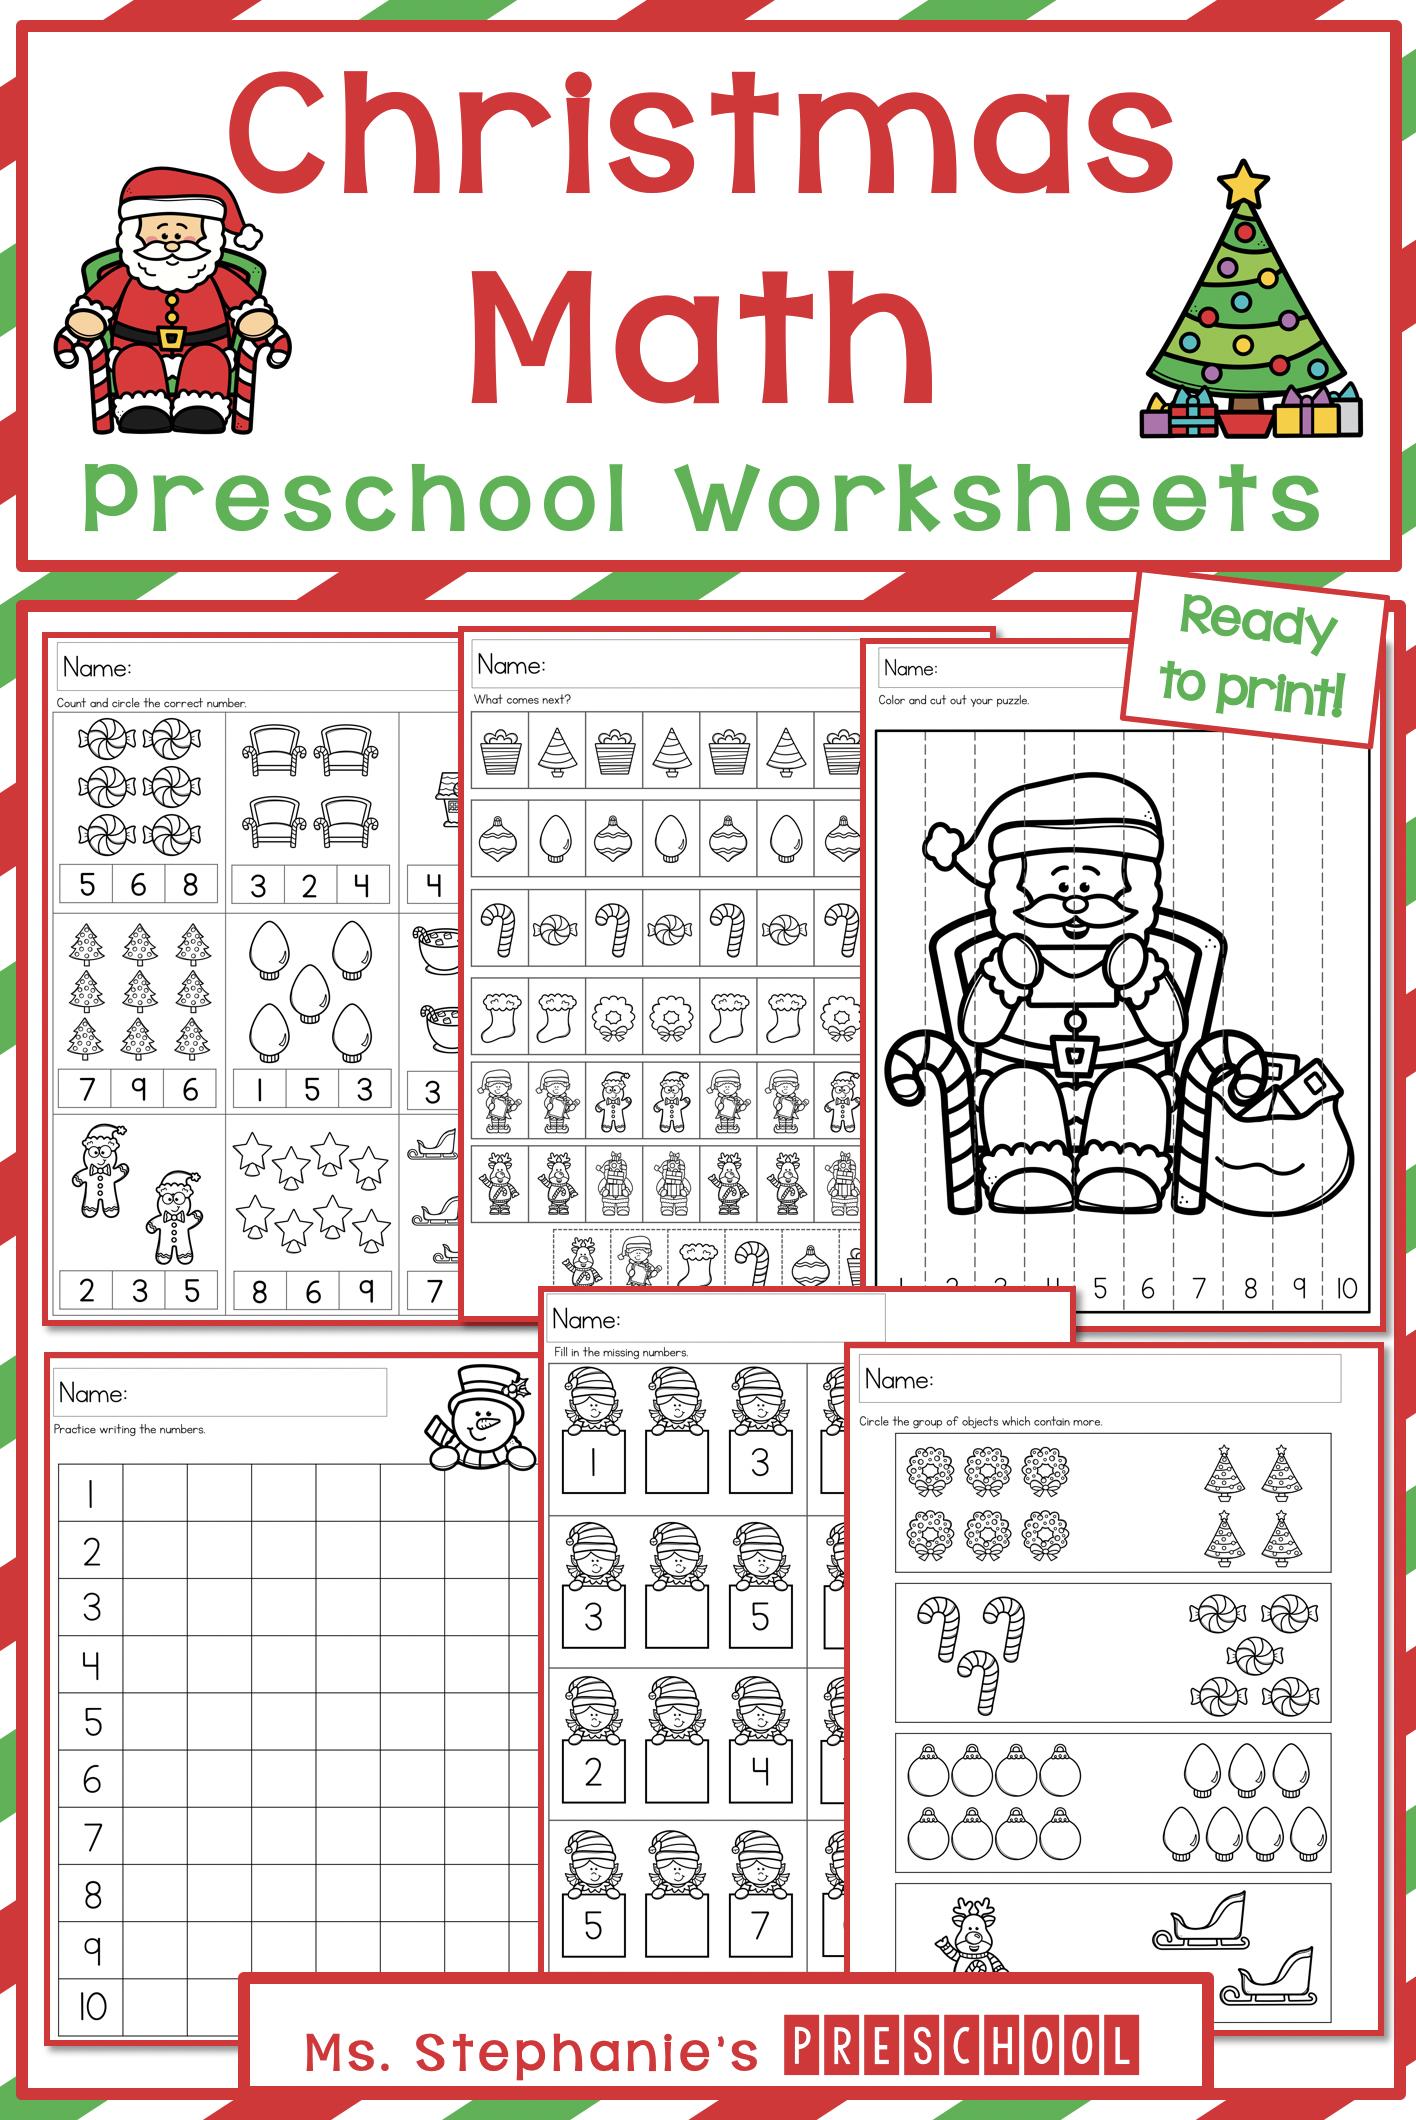 Christmas Preschool Math Worksheets Preschool Math Worksheets Math Worksheets Preschool Math [ 2120 x 1416 Pixel ]